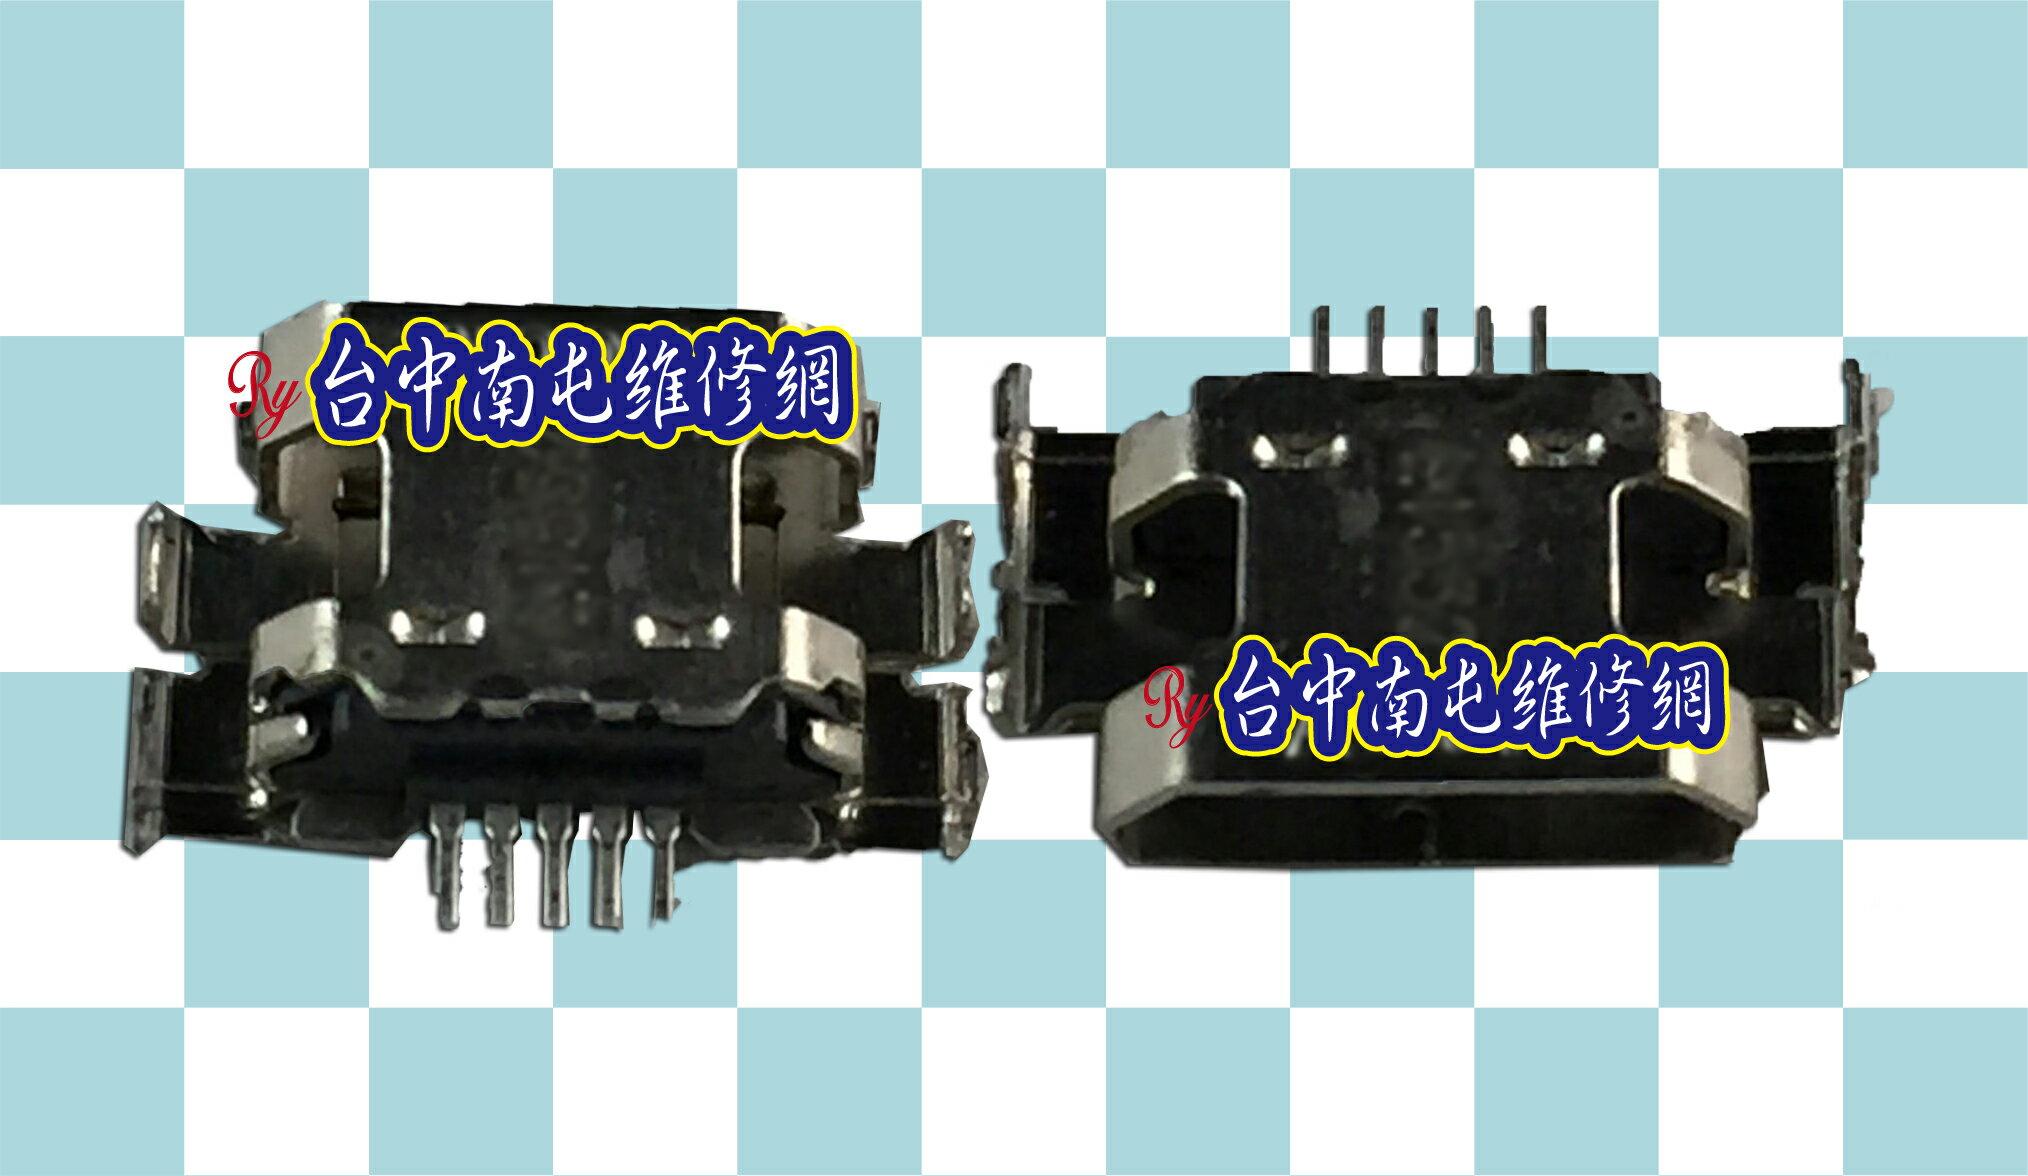 ASUS ZF2 單尾插 DIY價 99元-Ry台中南屯維修網